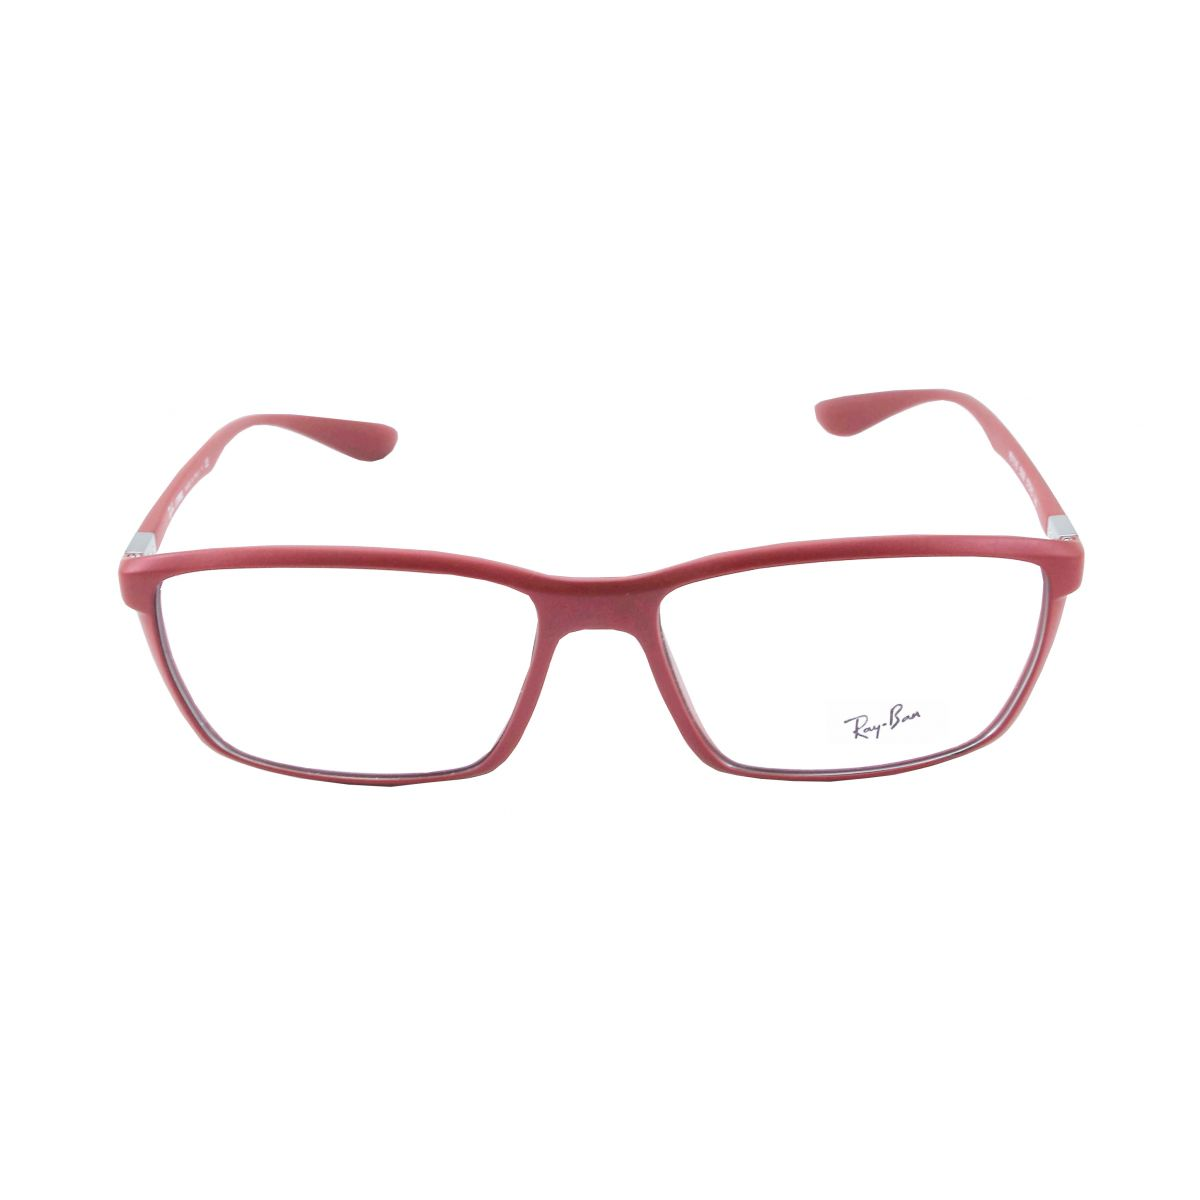 óculos Ray Ban Feminino Branco - Restaurant and Palinka Bar 6adf1b57a9